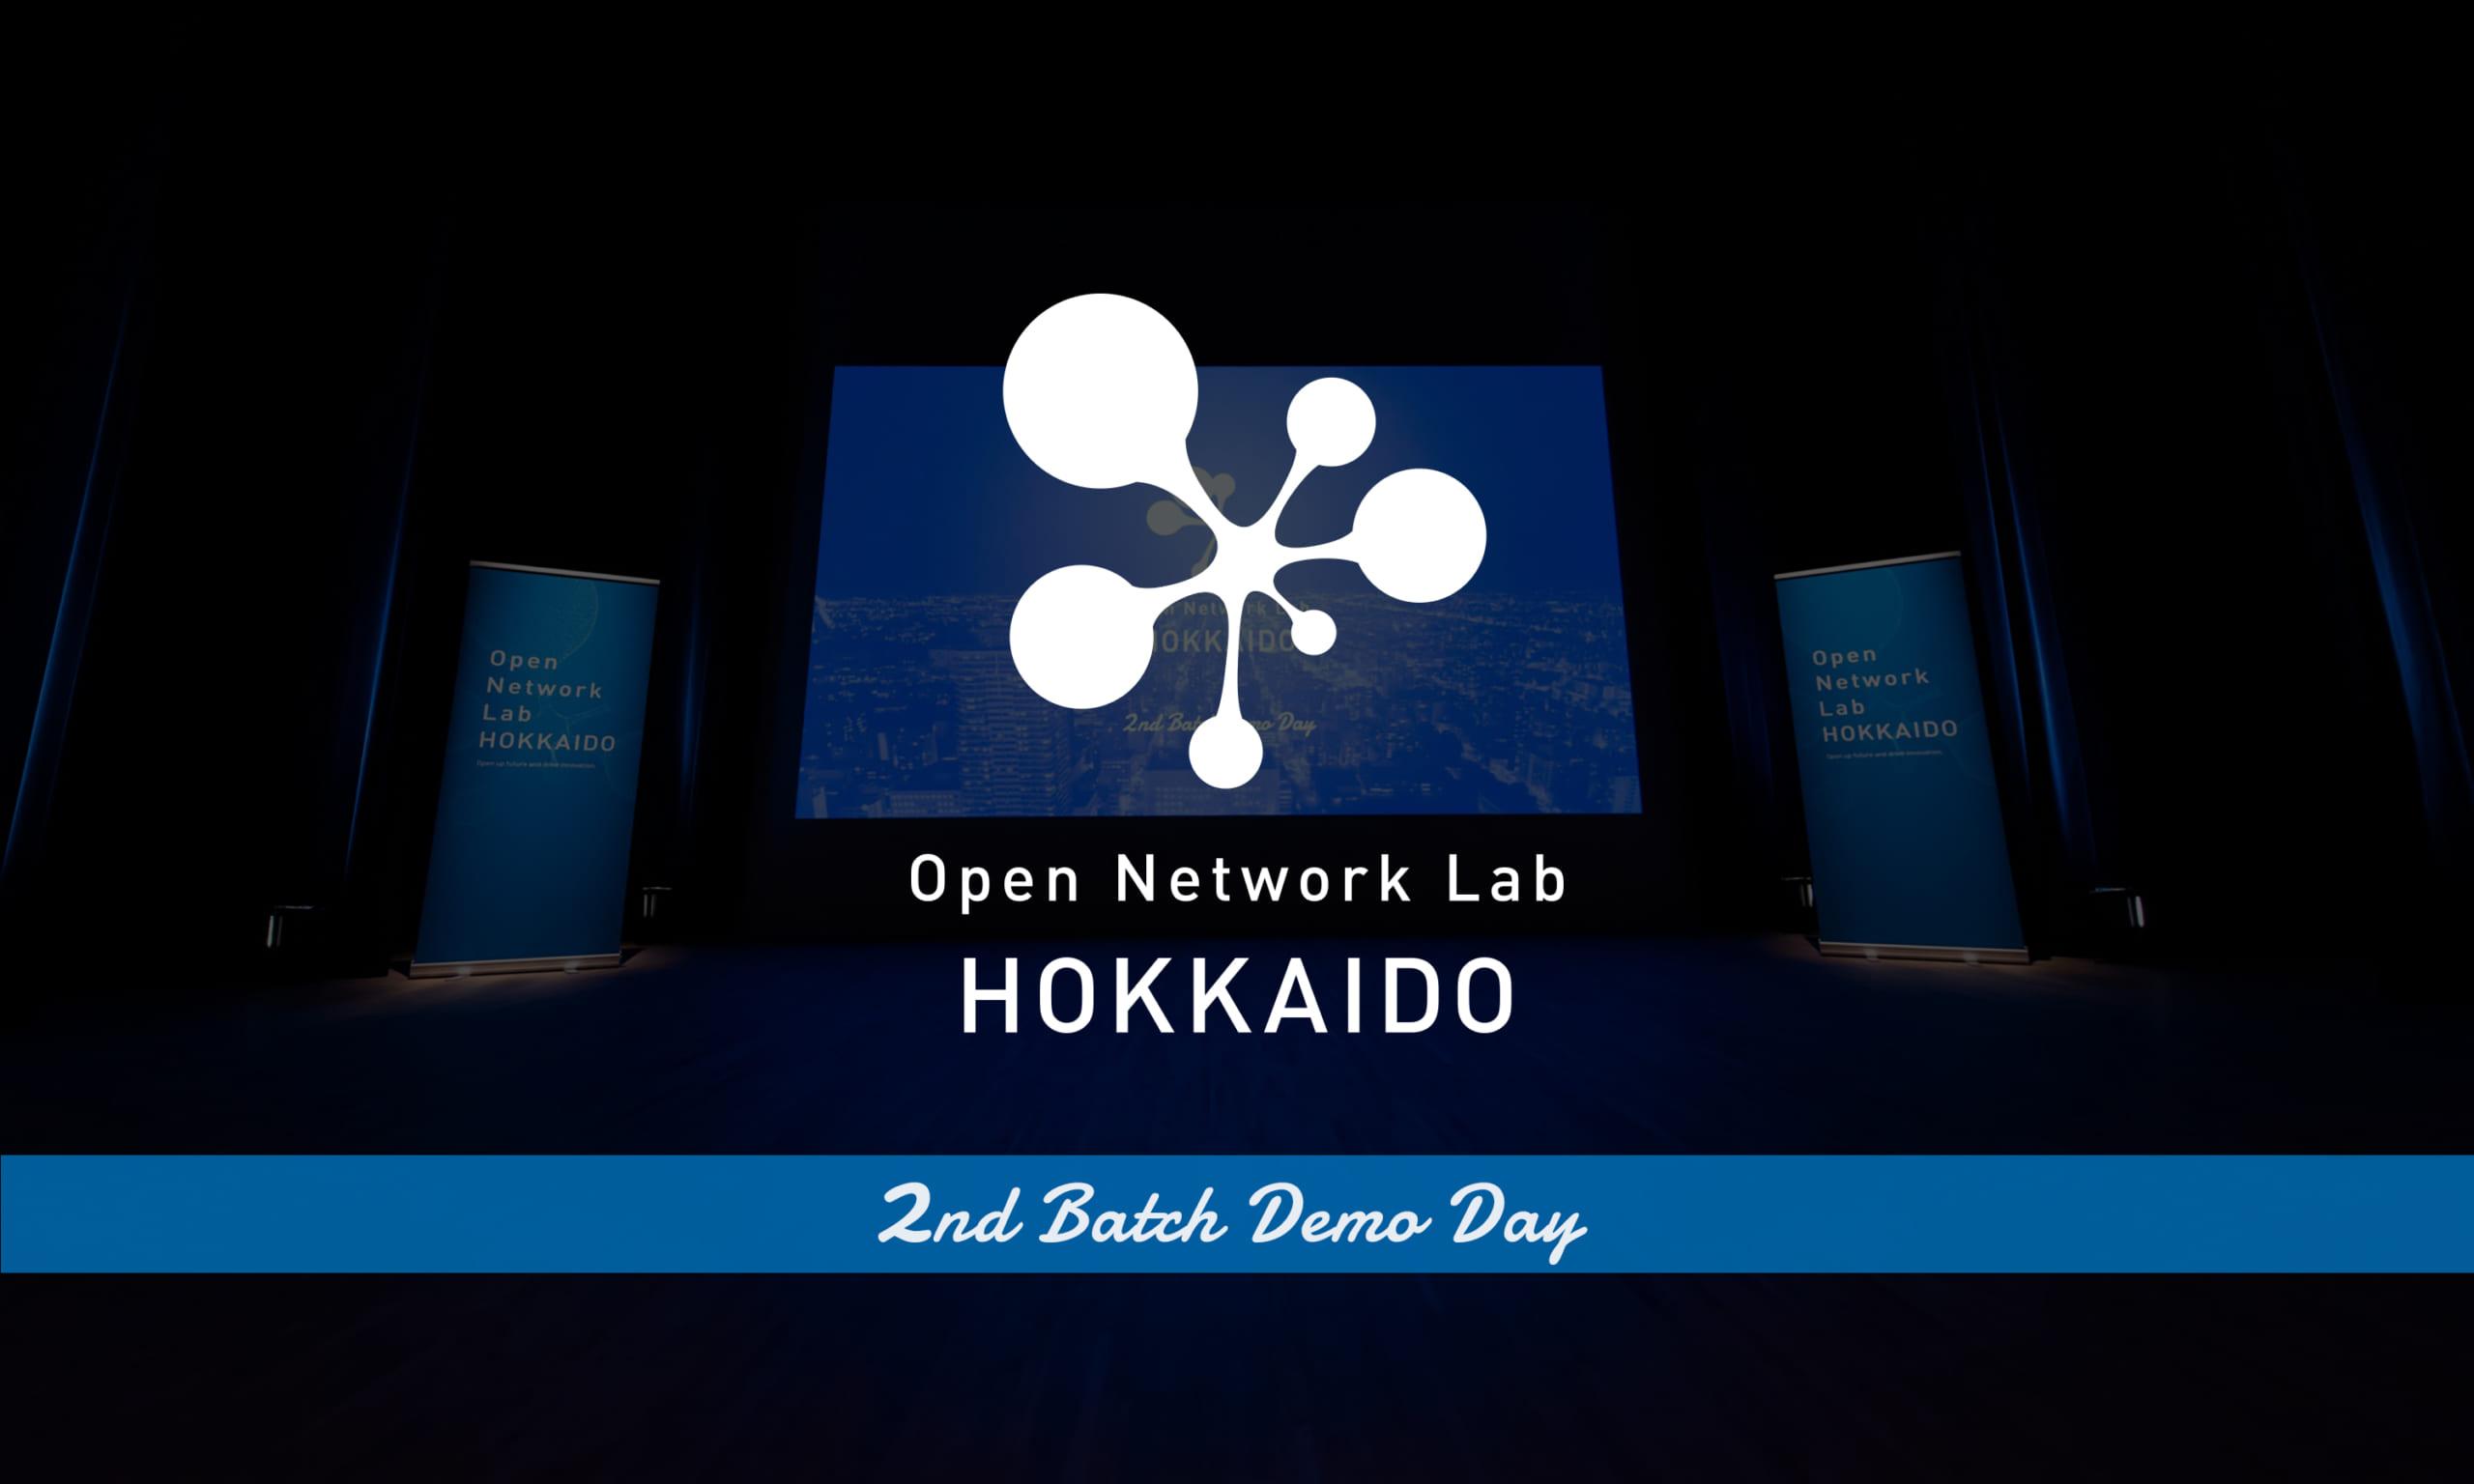 Open Network Lab HOKKAIDO 2nd Batch Demo Day Report